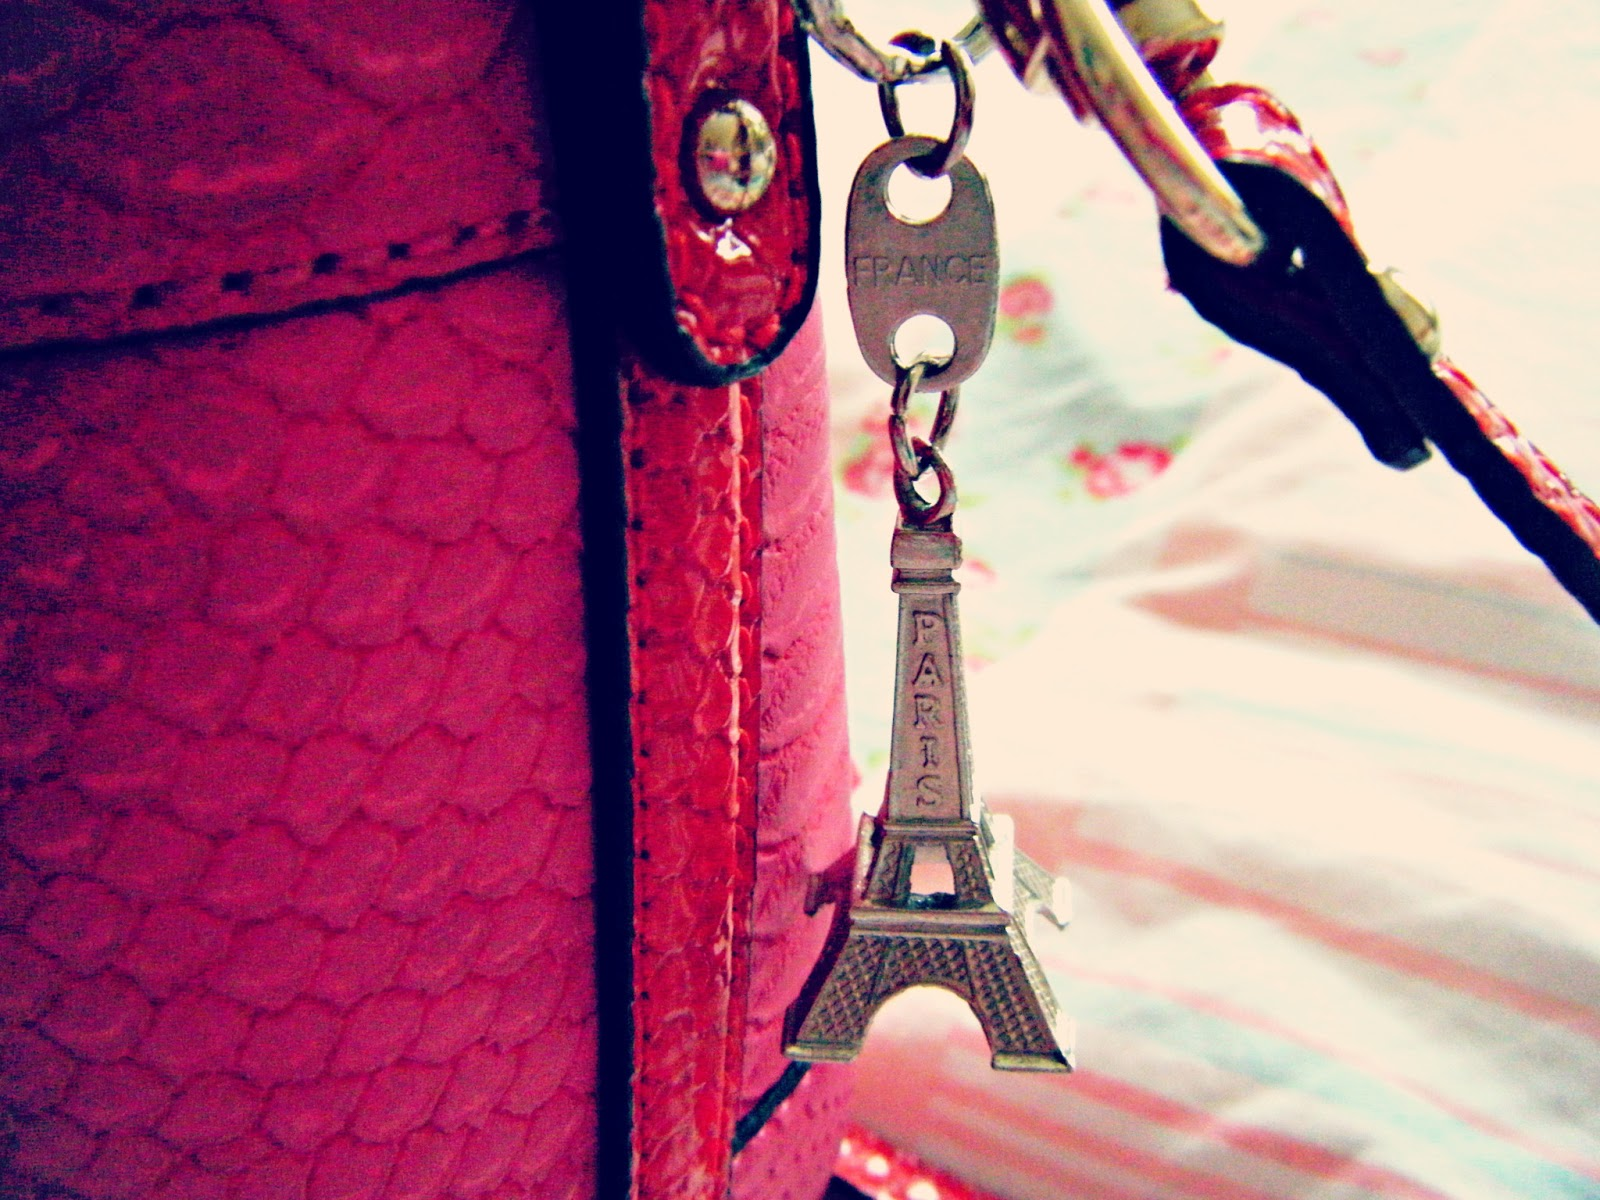 4cb1568b5a1b Inside my handbag I always carry with me